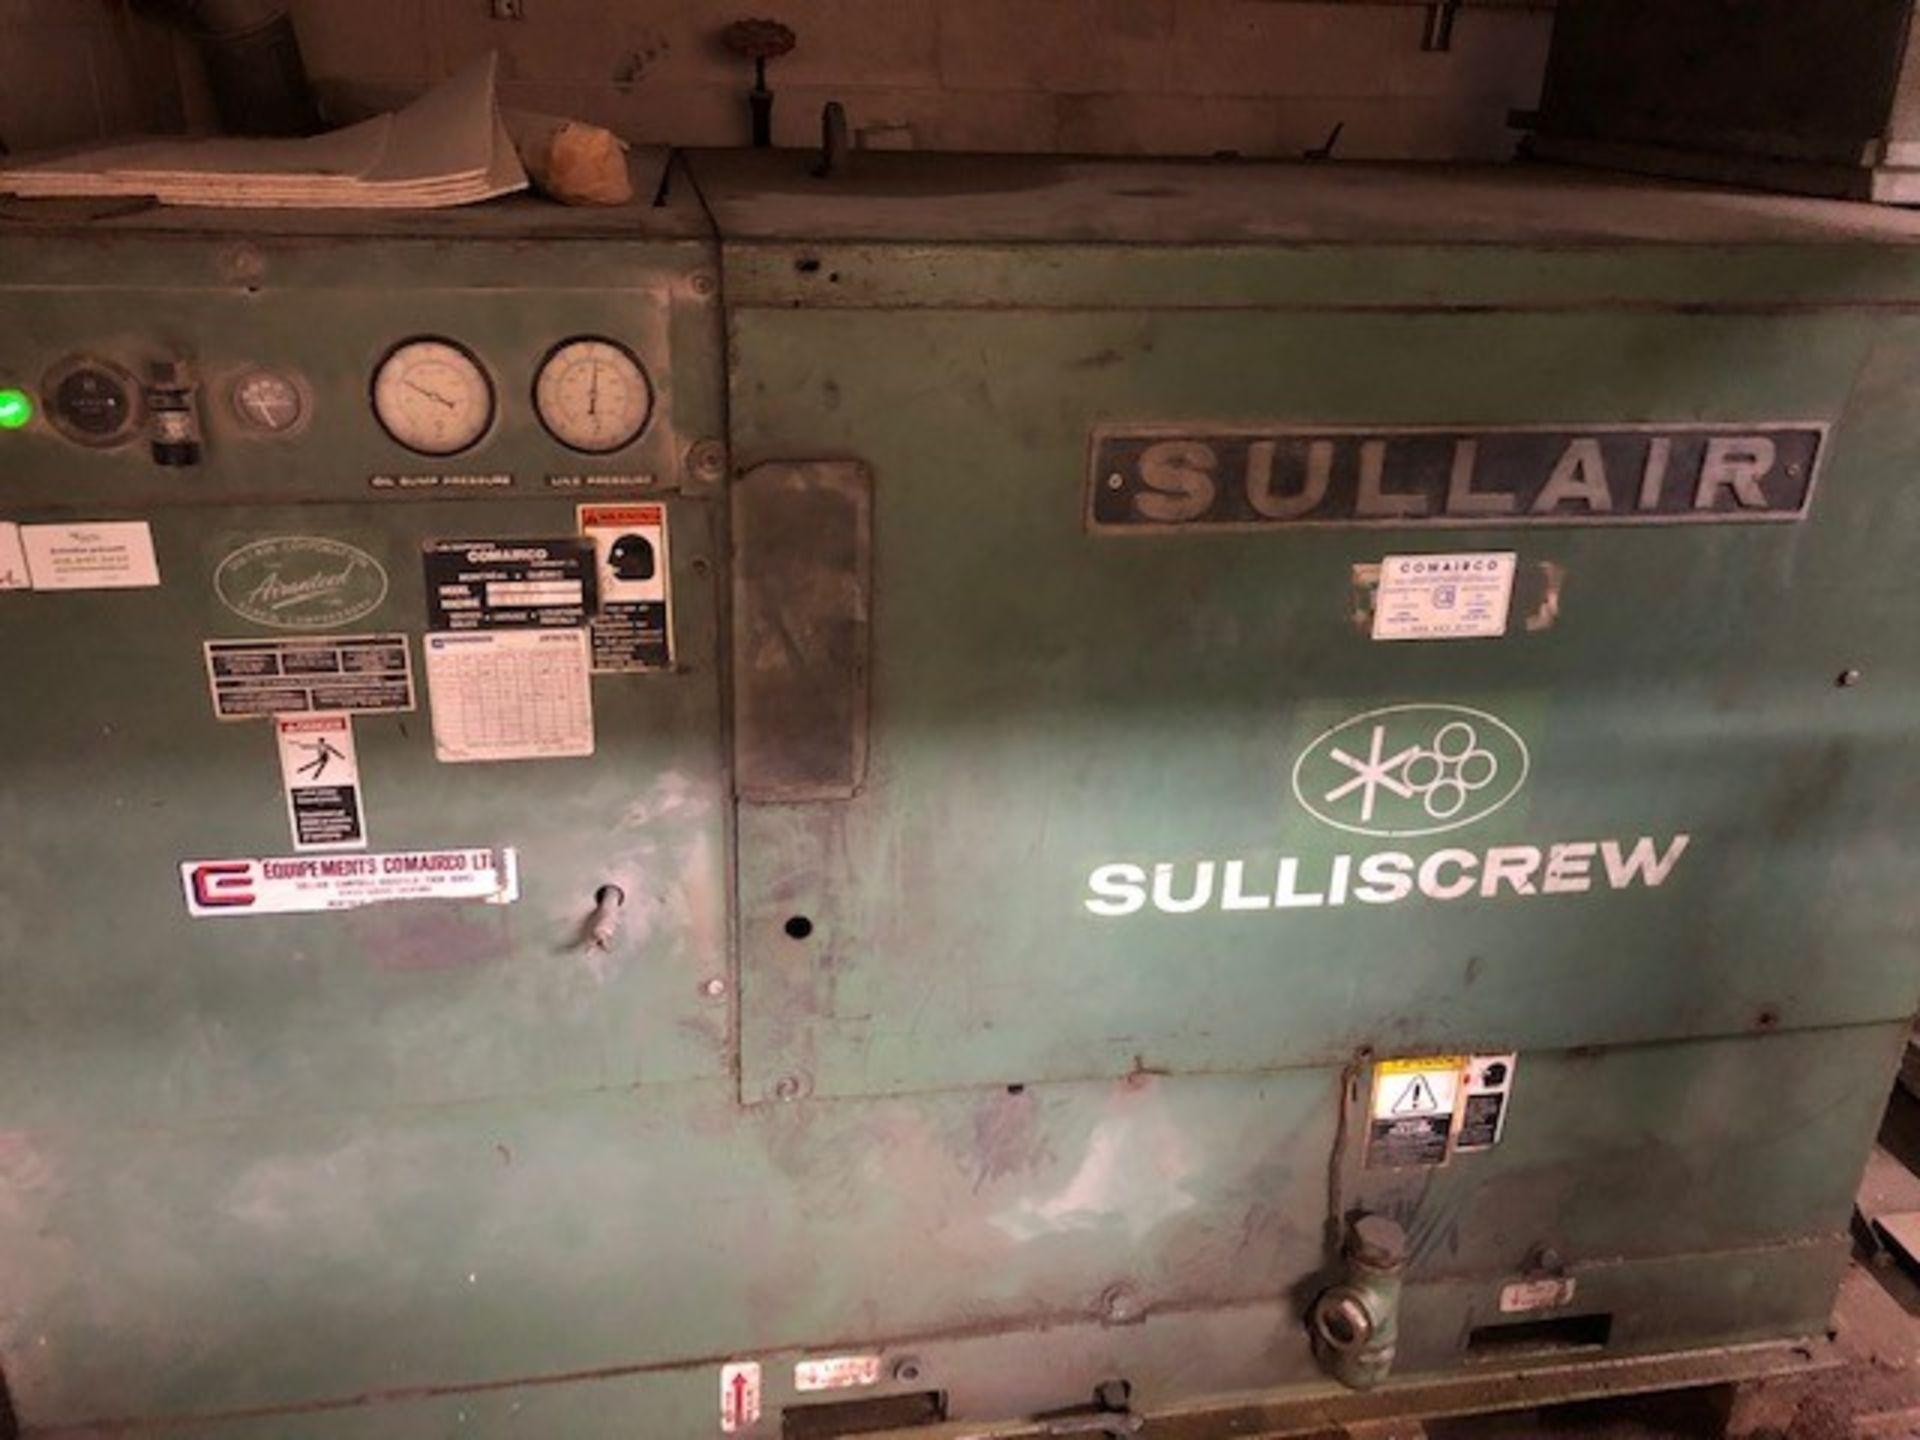 Air Compressor 75hp Sullair, Model: LS-20S-150H ACAC, s/n: 003-112279